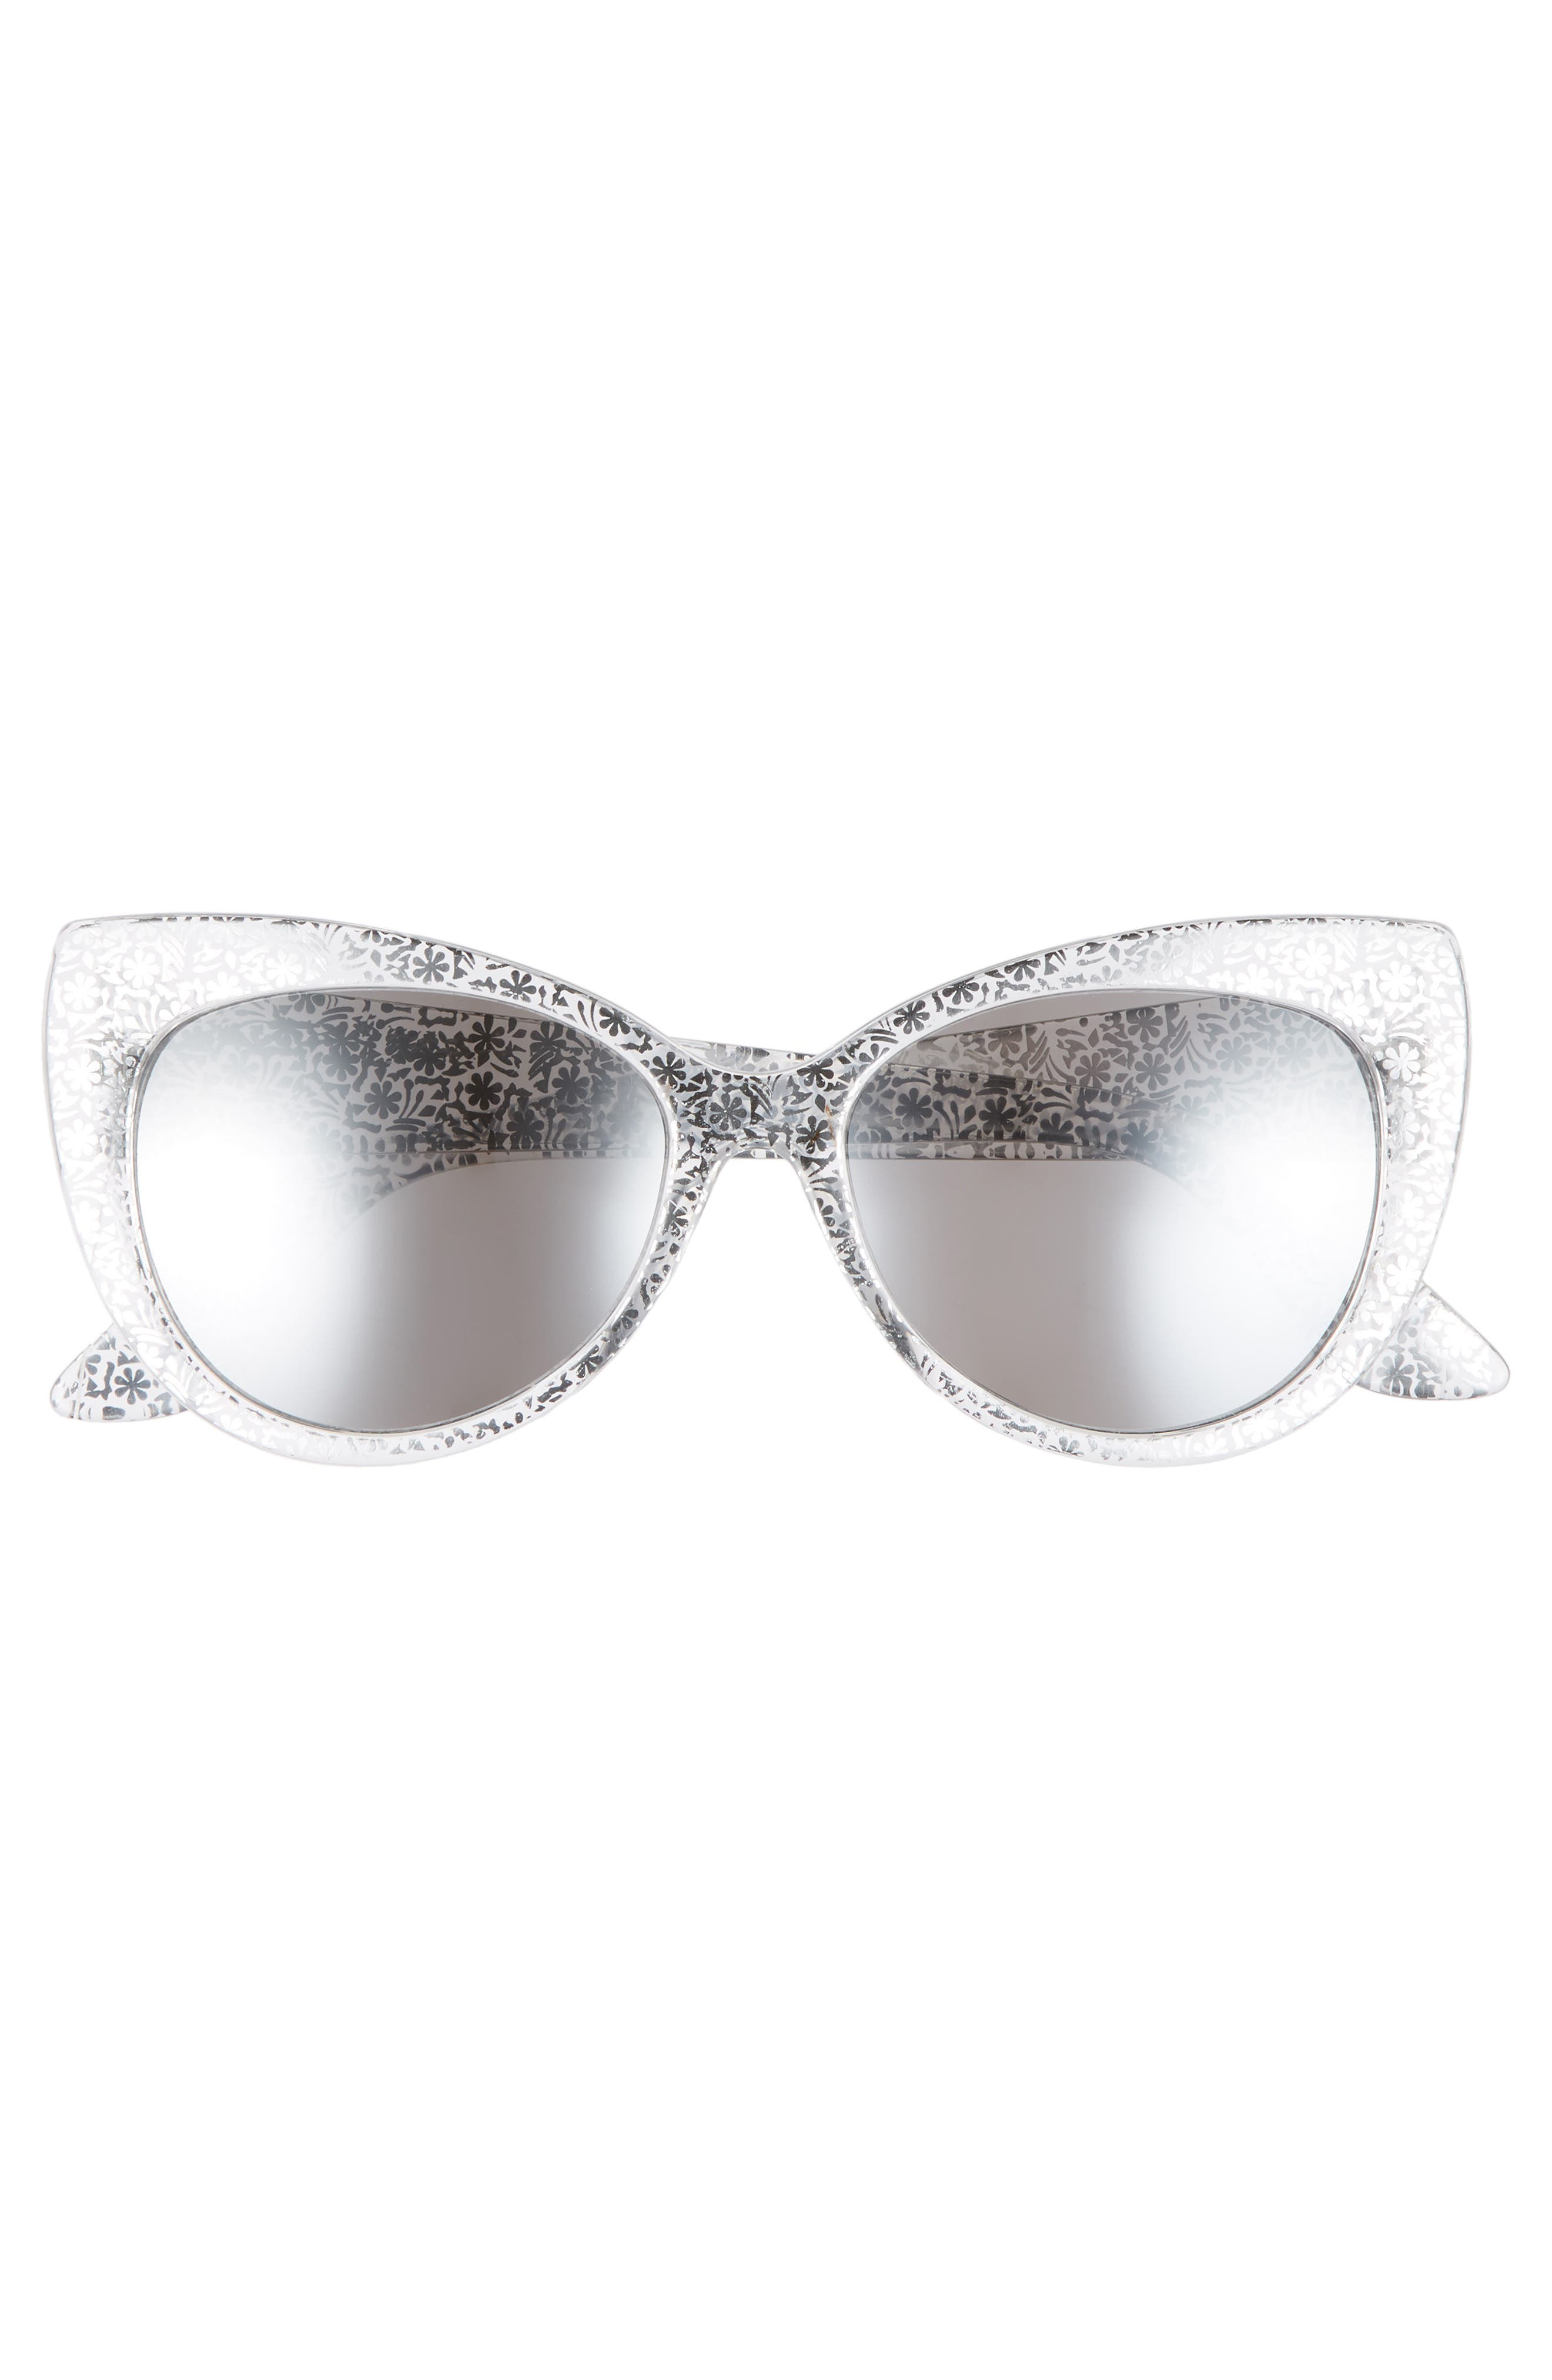 55mm Floral Cat Eye Sunglasses,                             Alternate thumbnail 3, color,                             040